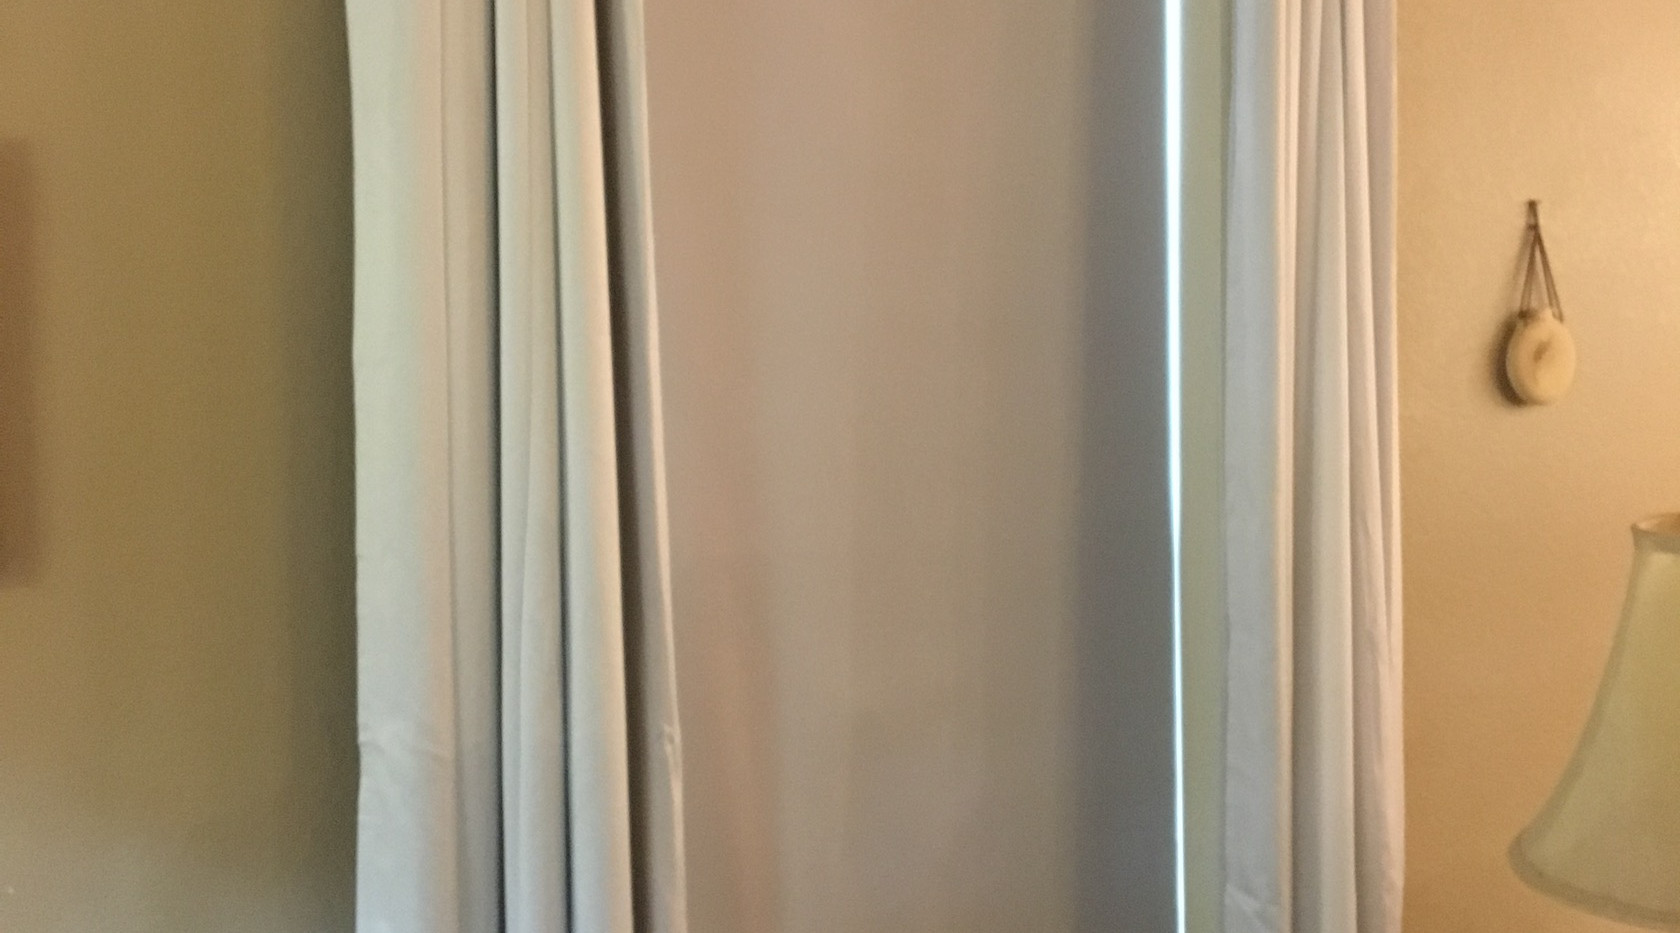 South window open drapes